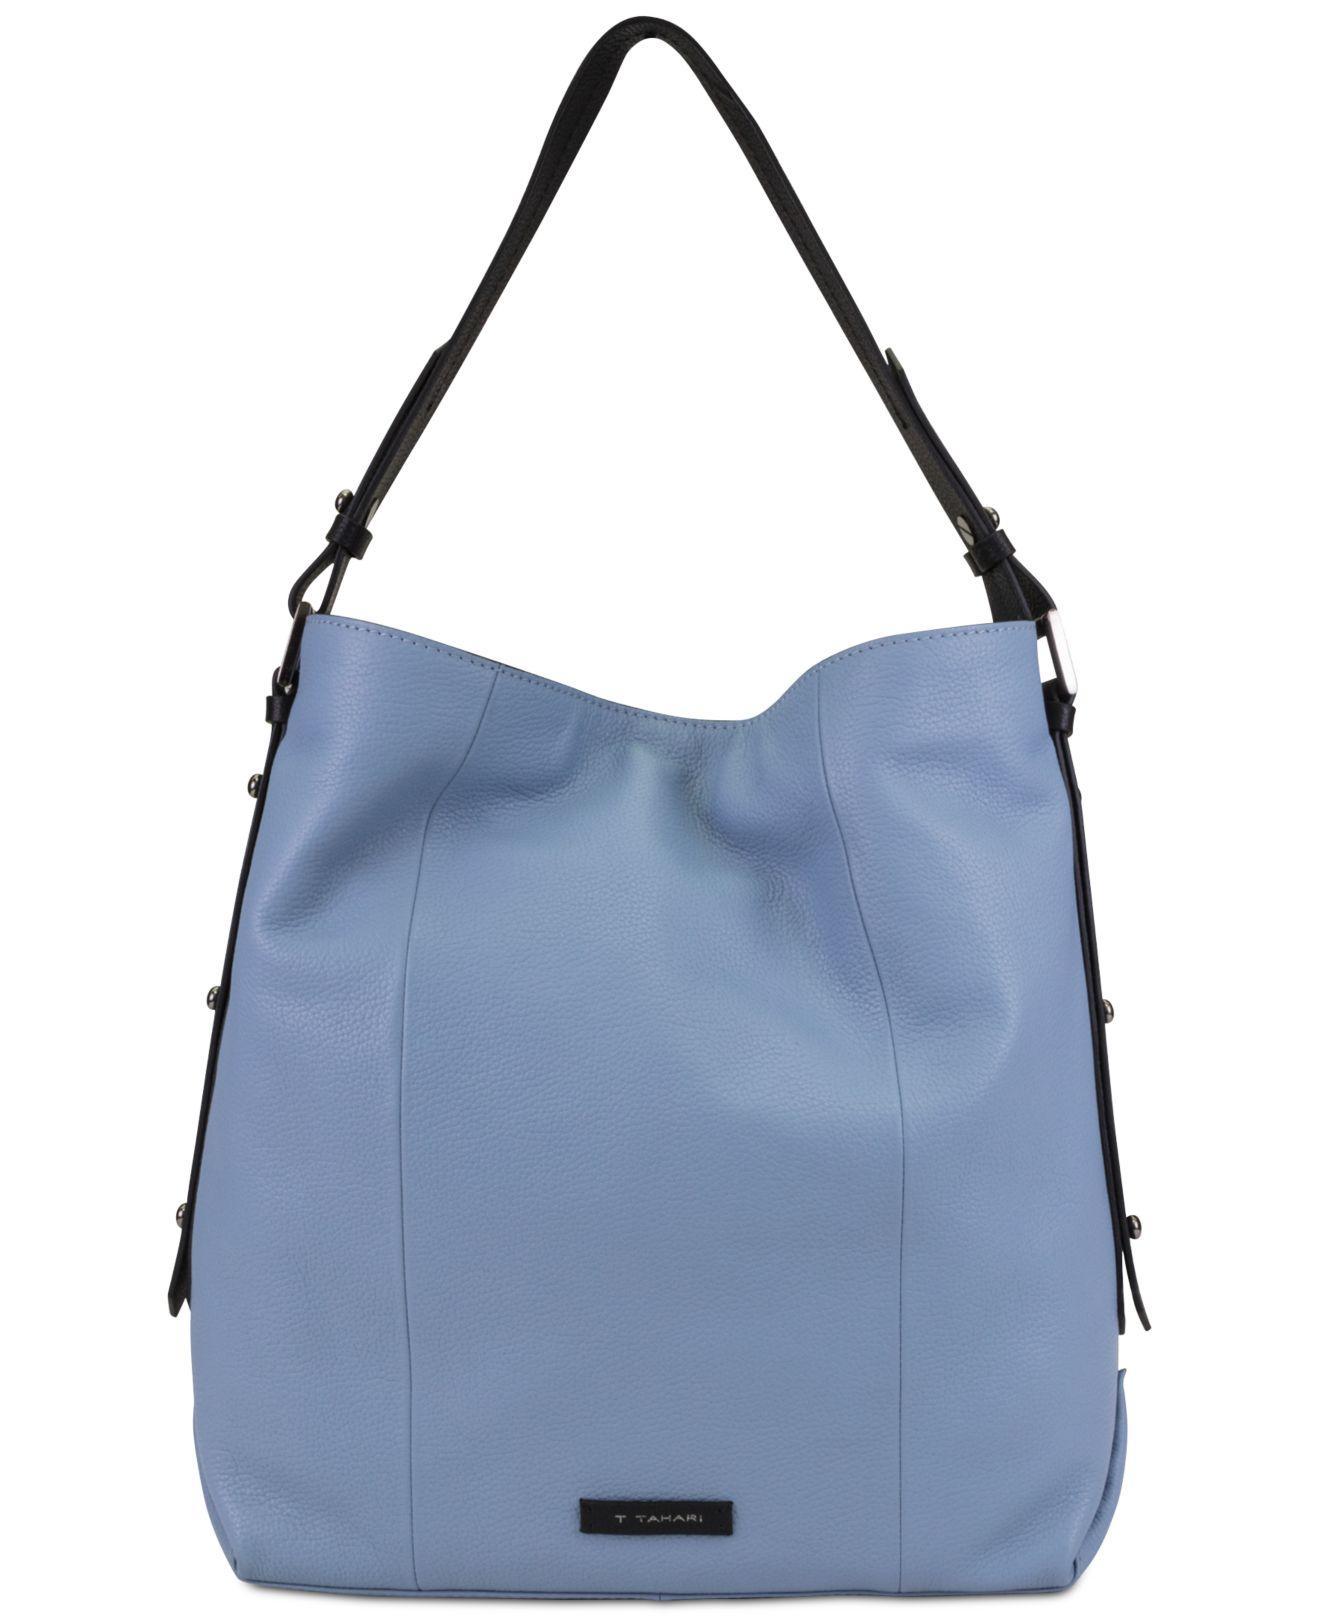 Lyst - T Tahari Parker Leather Bucket Bag in Blue 29fc707b4bd51